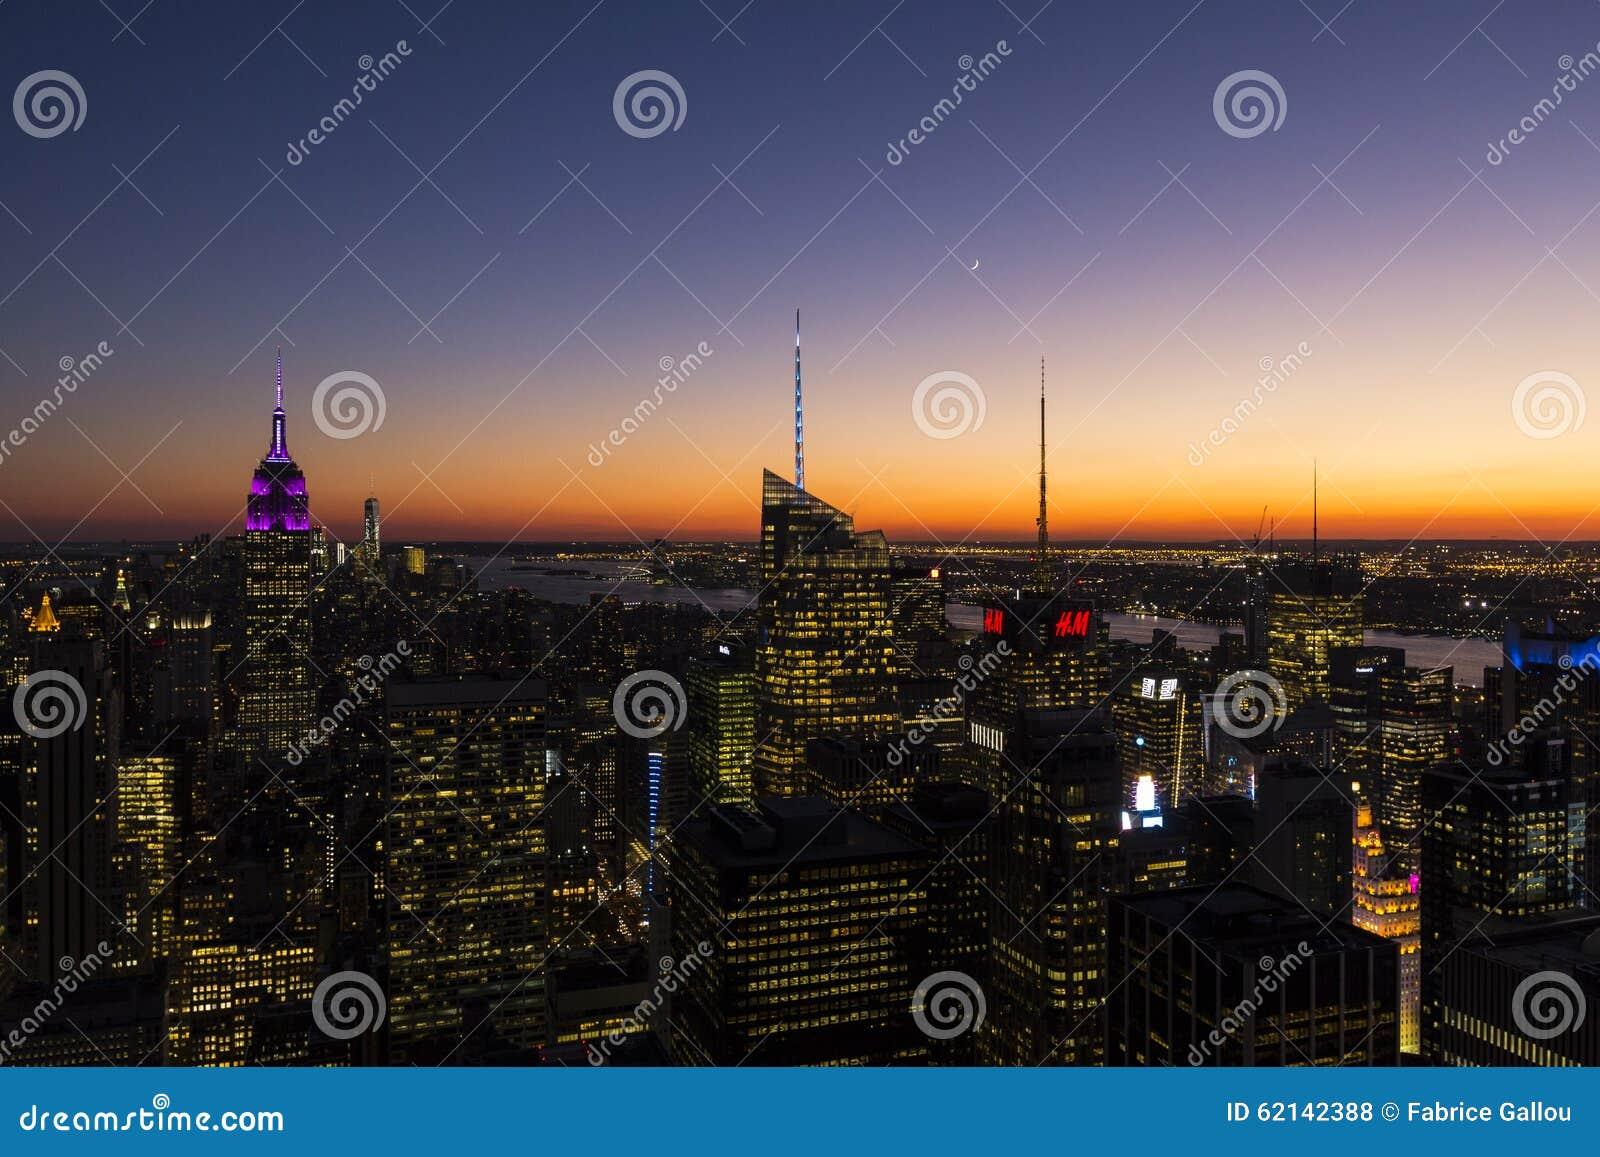 Midtown Manhattan Editorial Photo | CartoonDealer.com ...